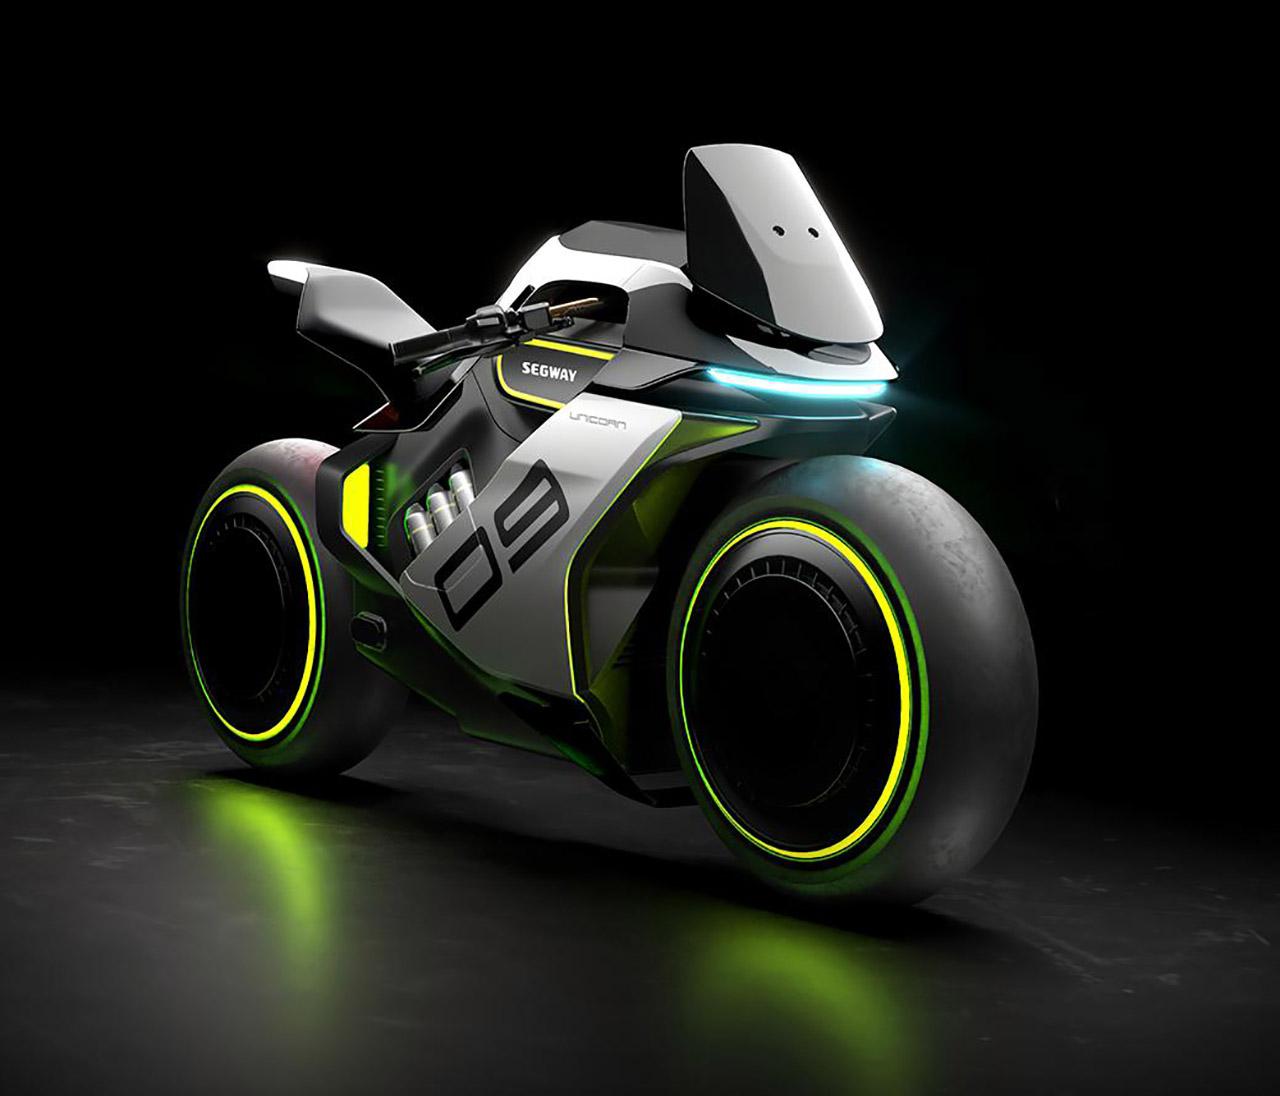 Segway Apex H2 Hydrogen Electric Hybrid Motorcycle